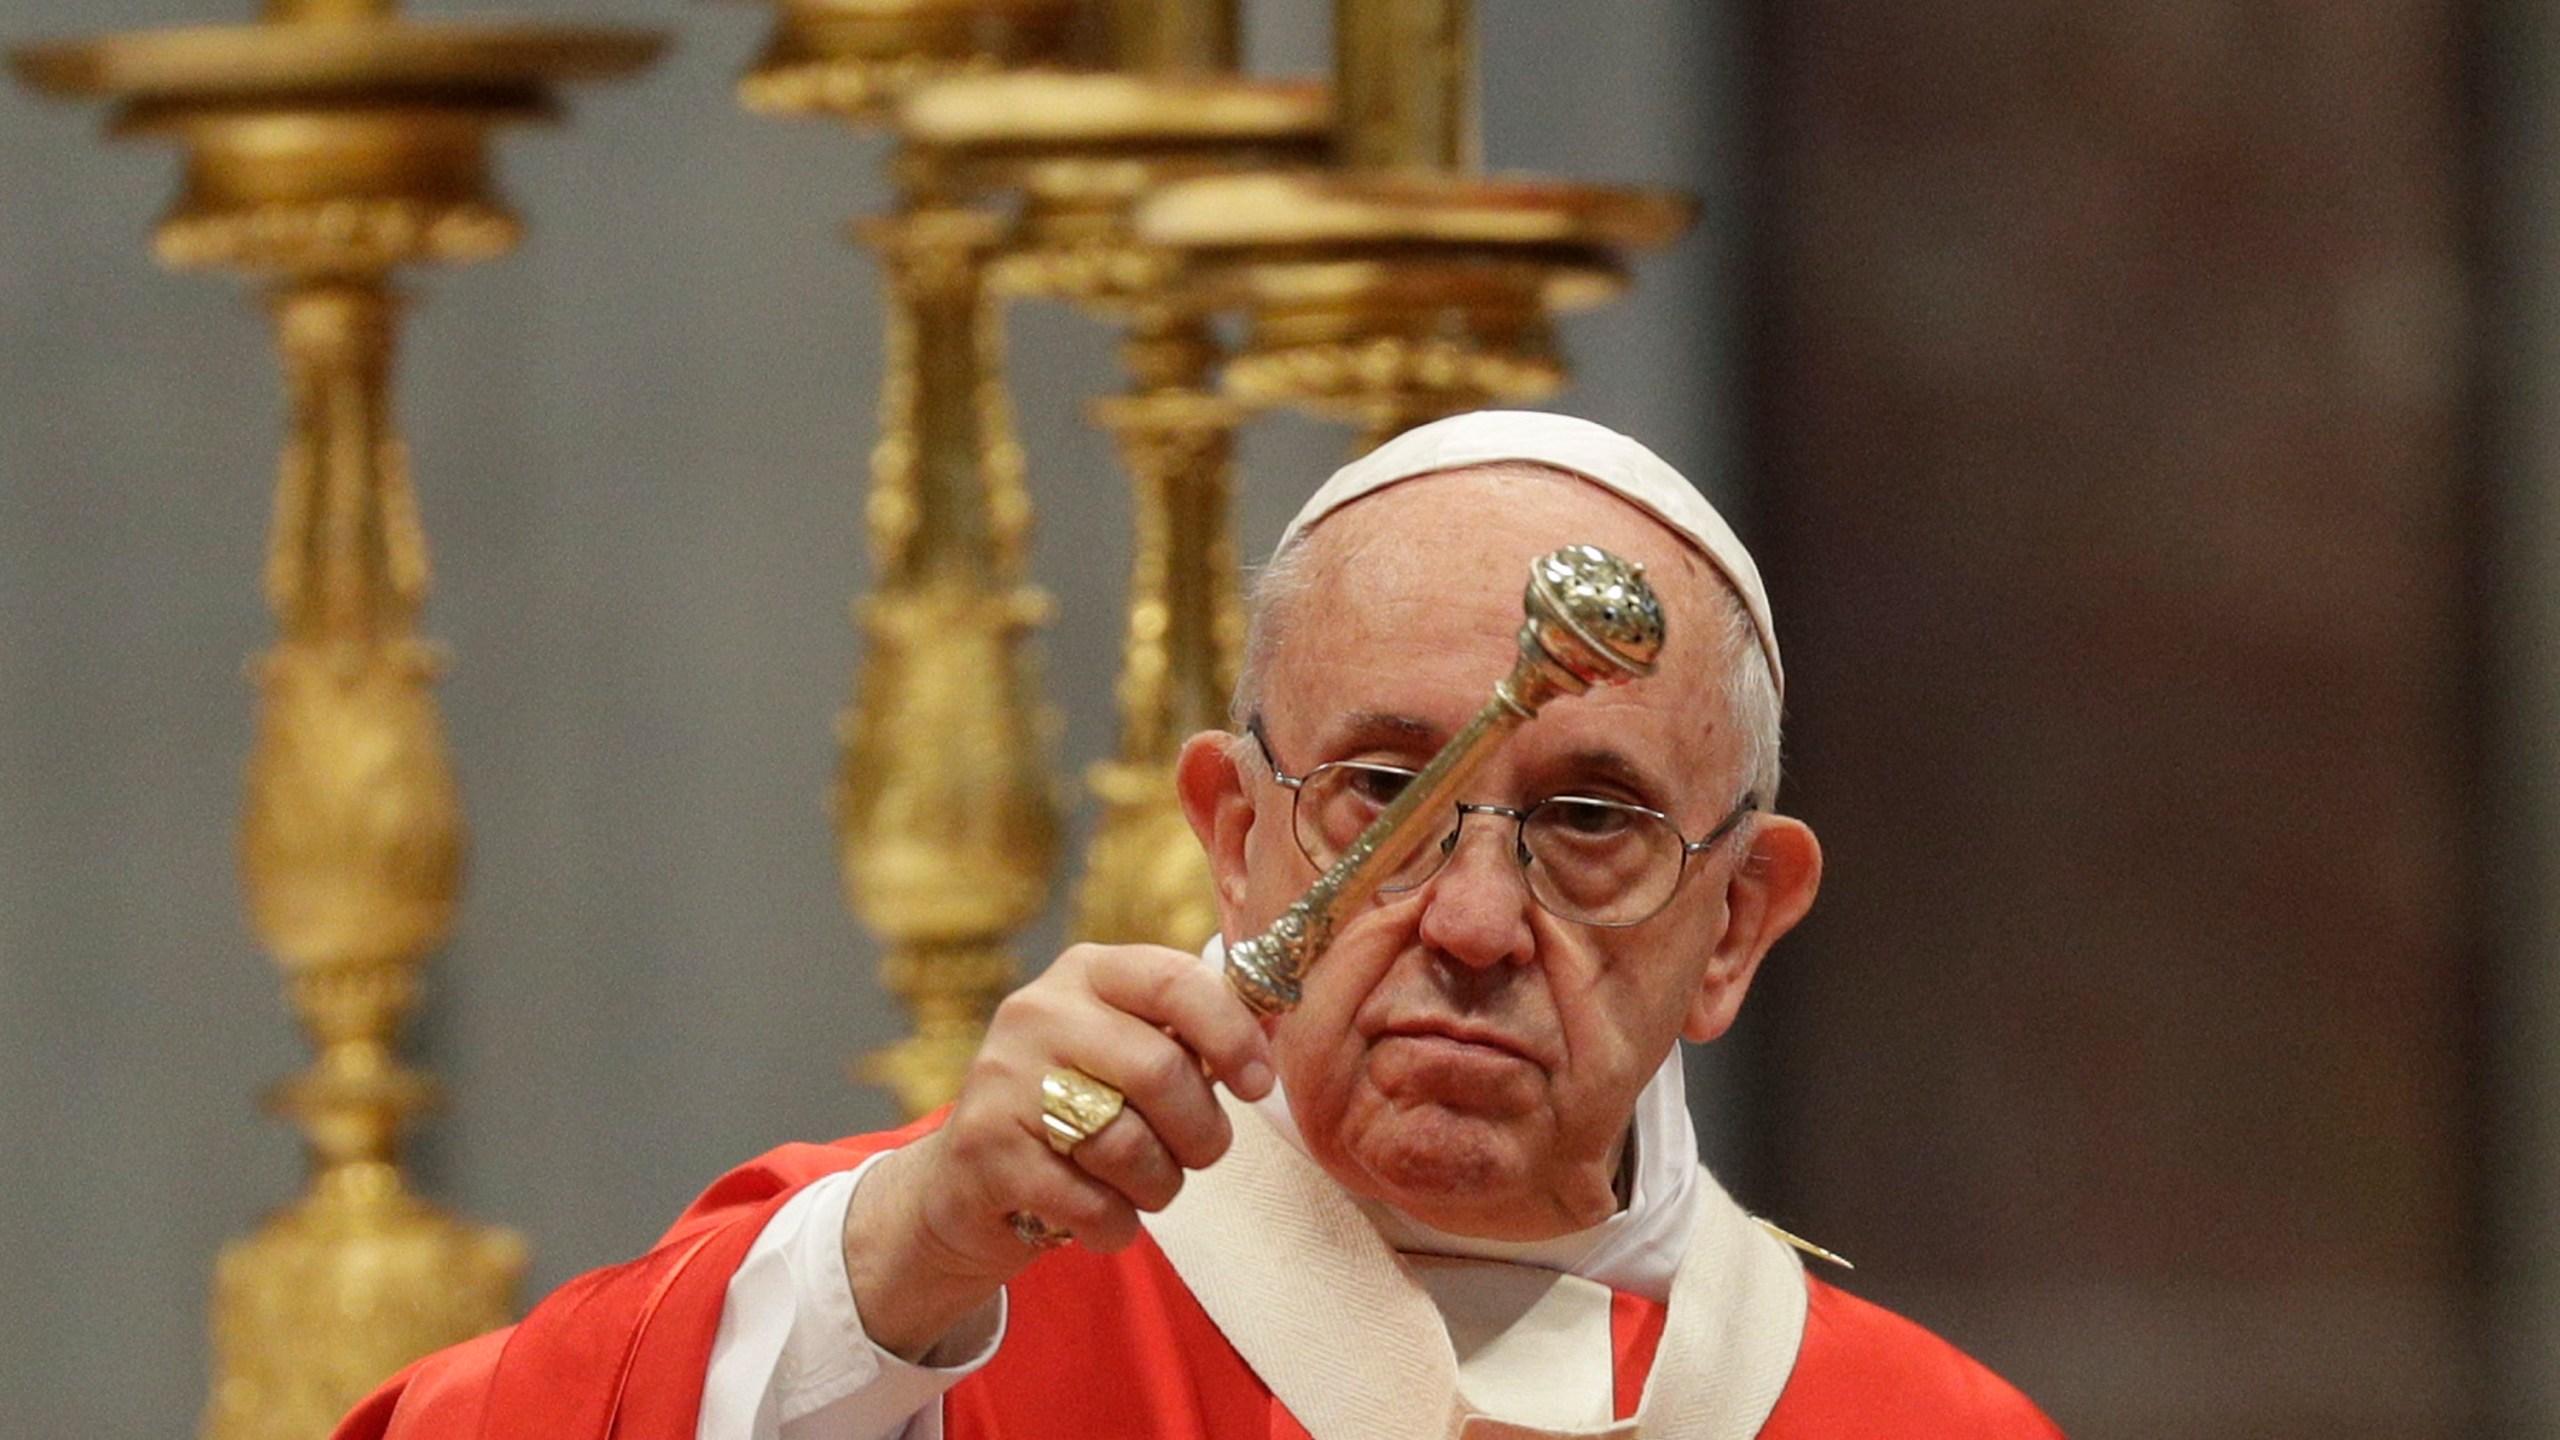 Vatican_Pope_94294-159532.jpg99437351